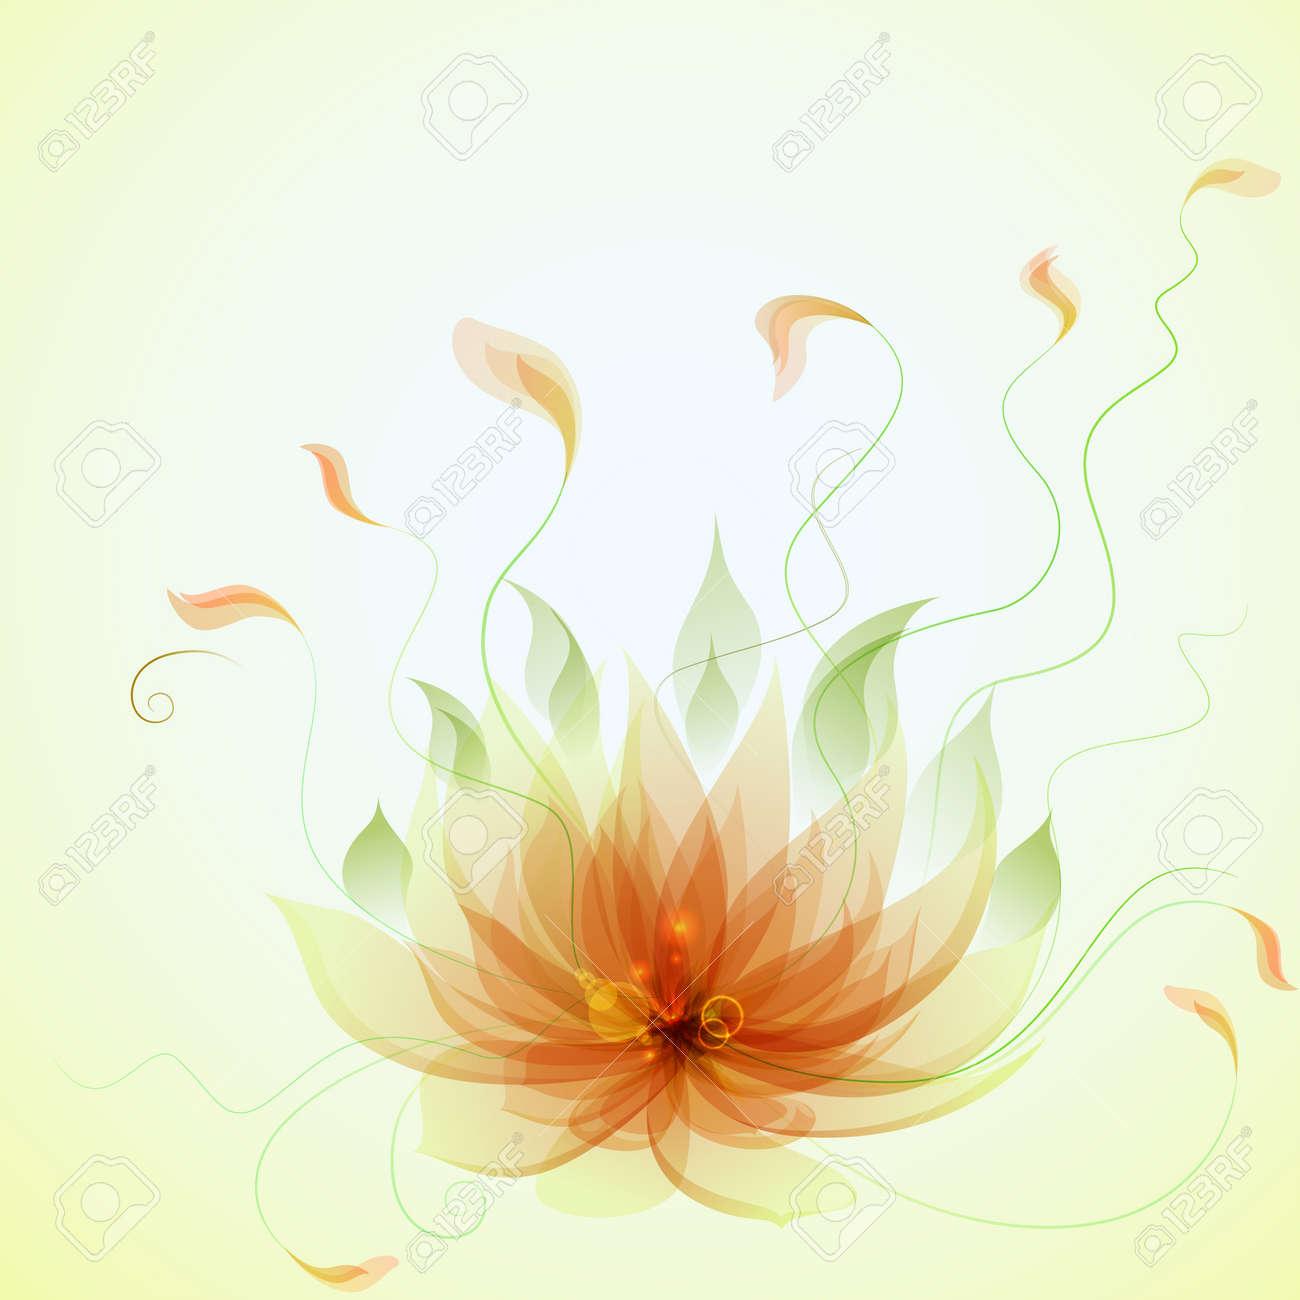 Abstract vector yellow lotus flower royalty free cliparts vectors abstract vector yellow lotus flower stock vector 14885970 mightylinksfo